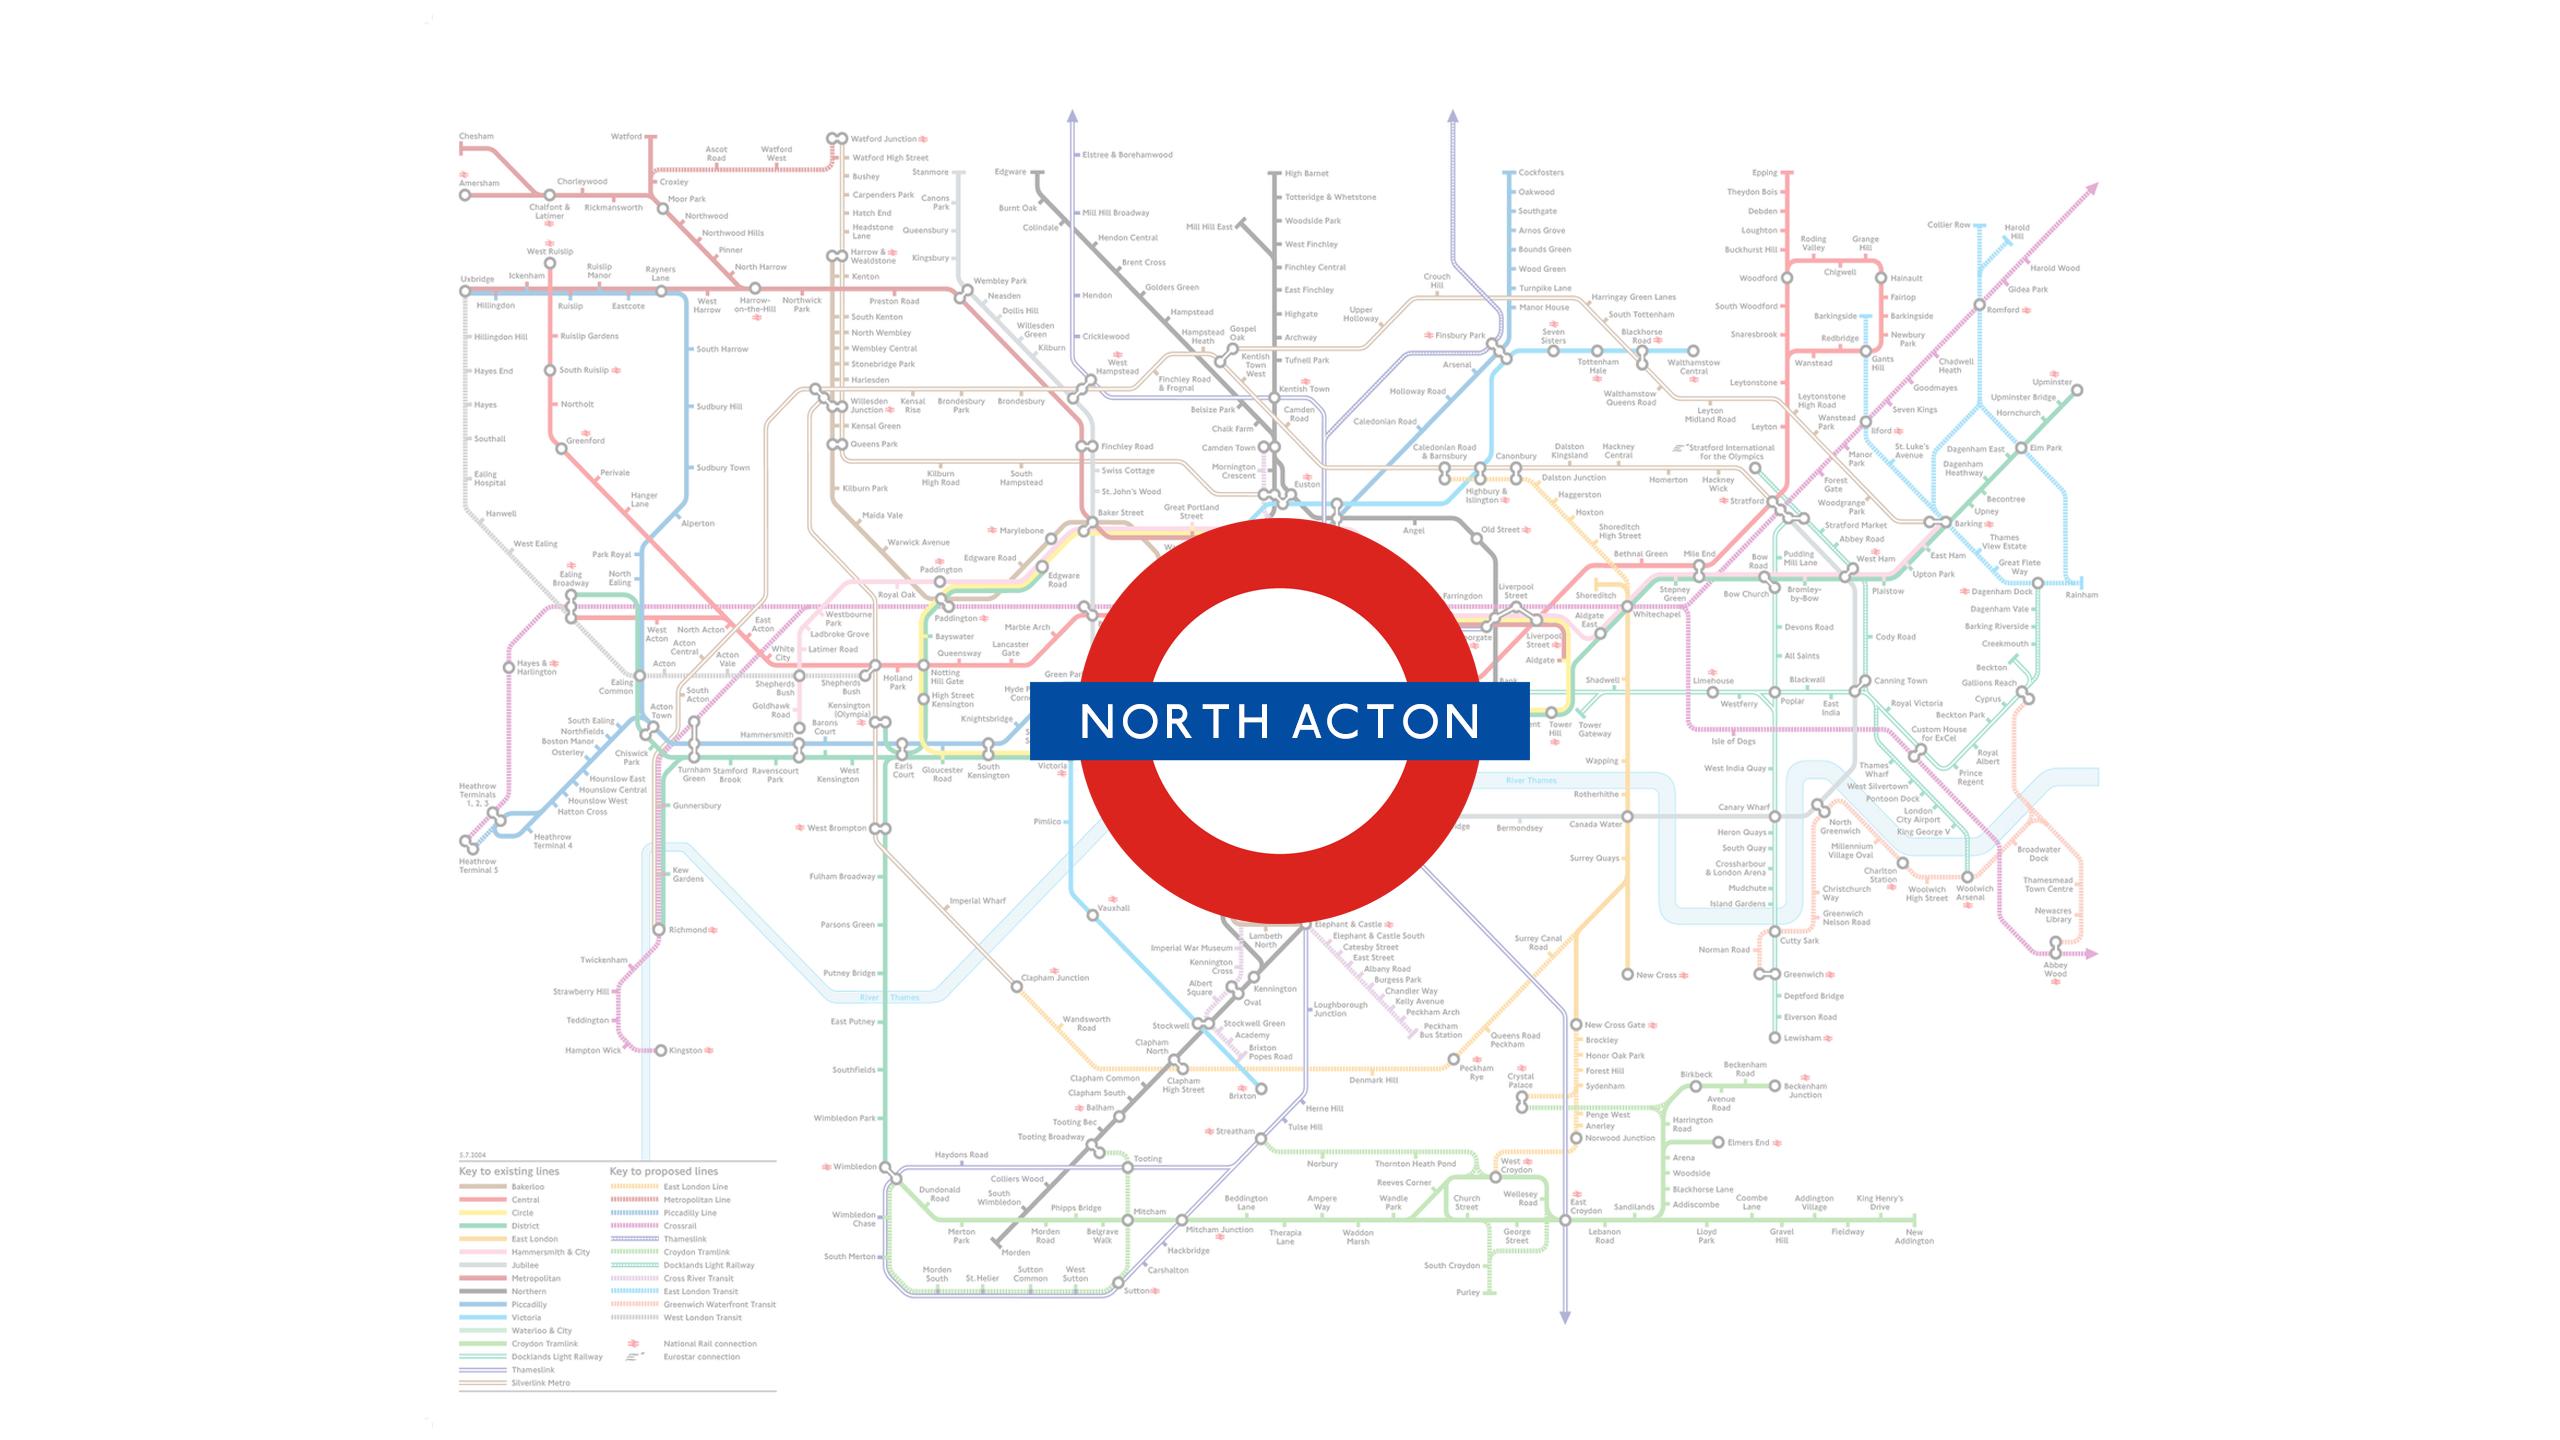 North Acton (Map)